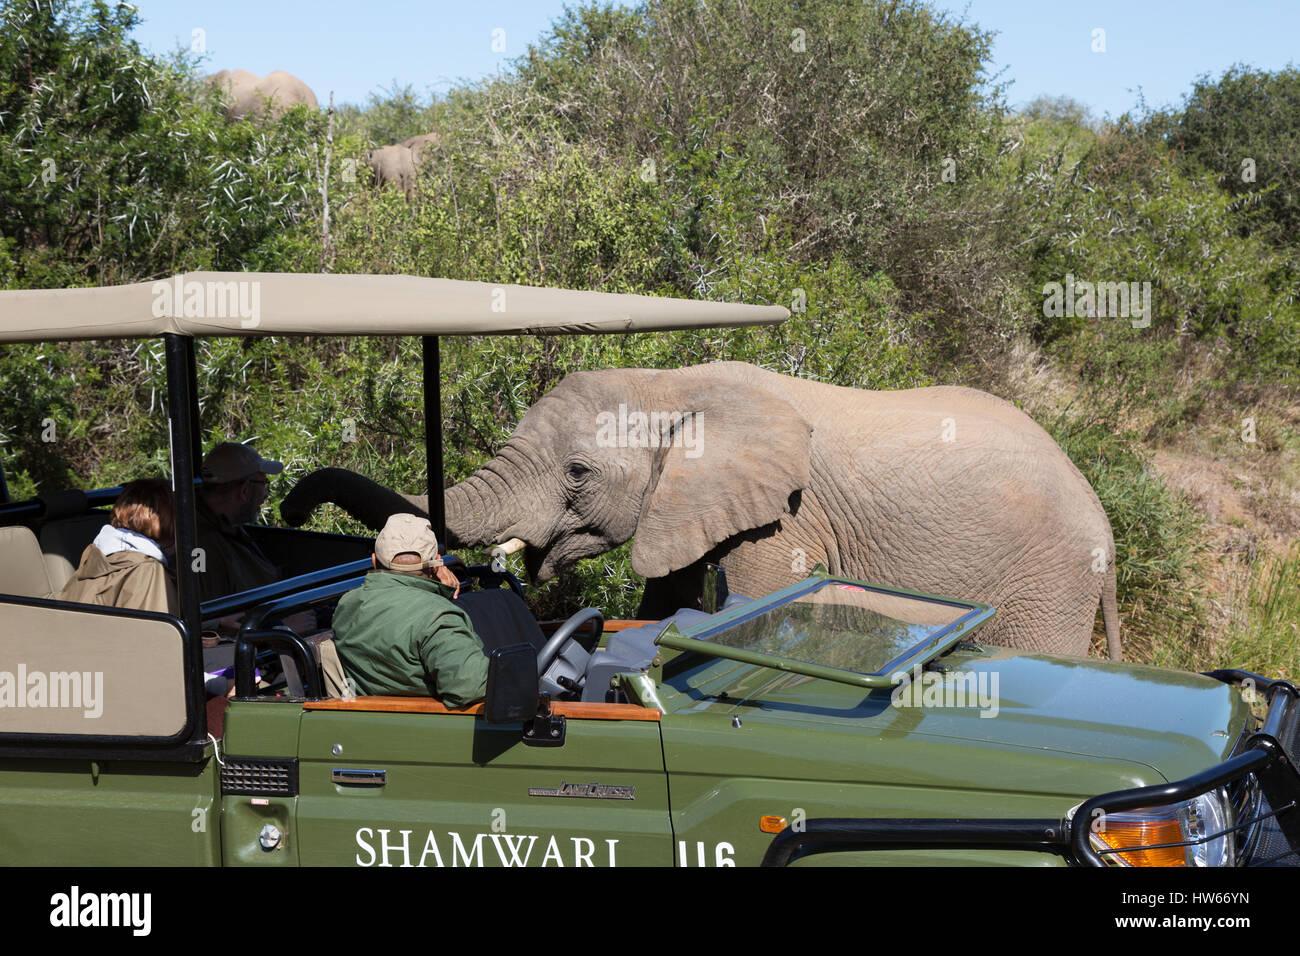 Südafrika Safari - Elefant Gruß Touristen auf eine Jeep Safari, Shamwari Game Reserve, Eastern Cape, Südafrika Stockbild